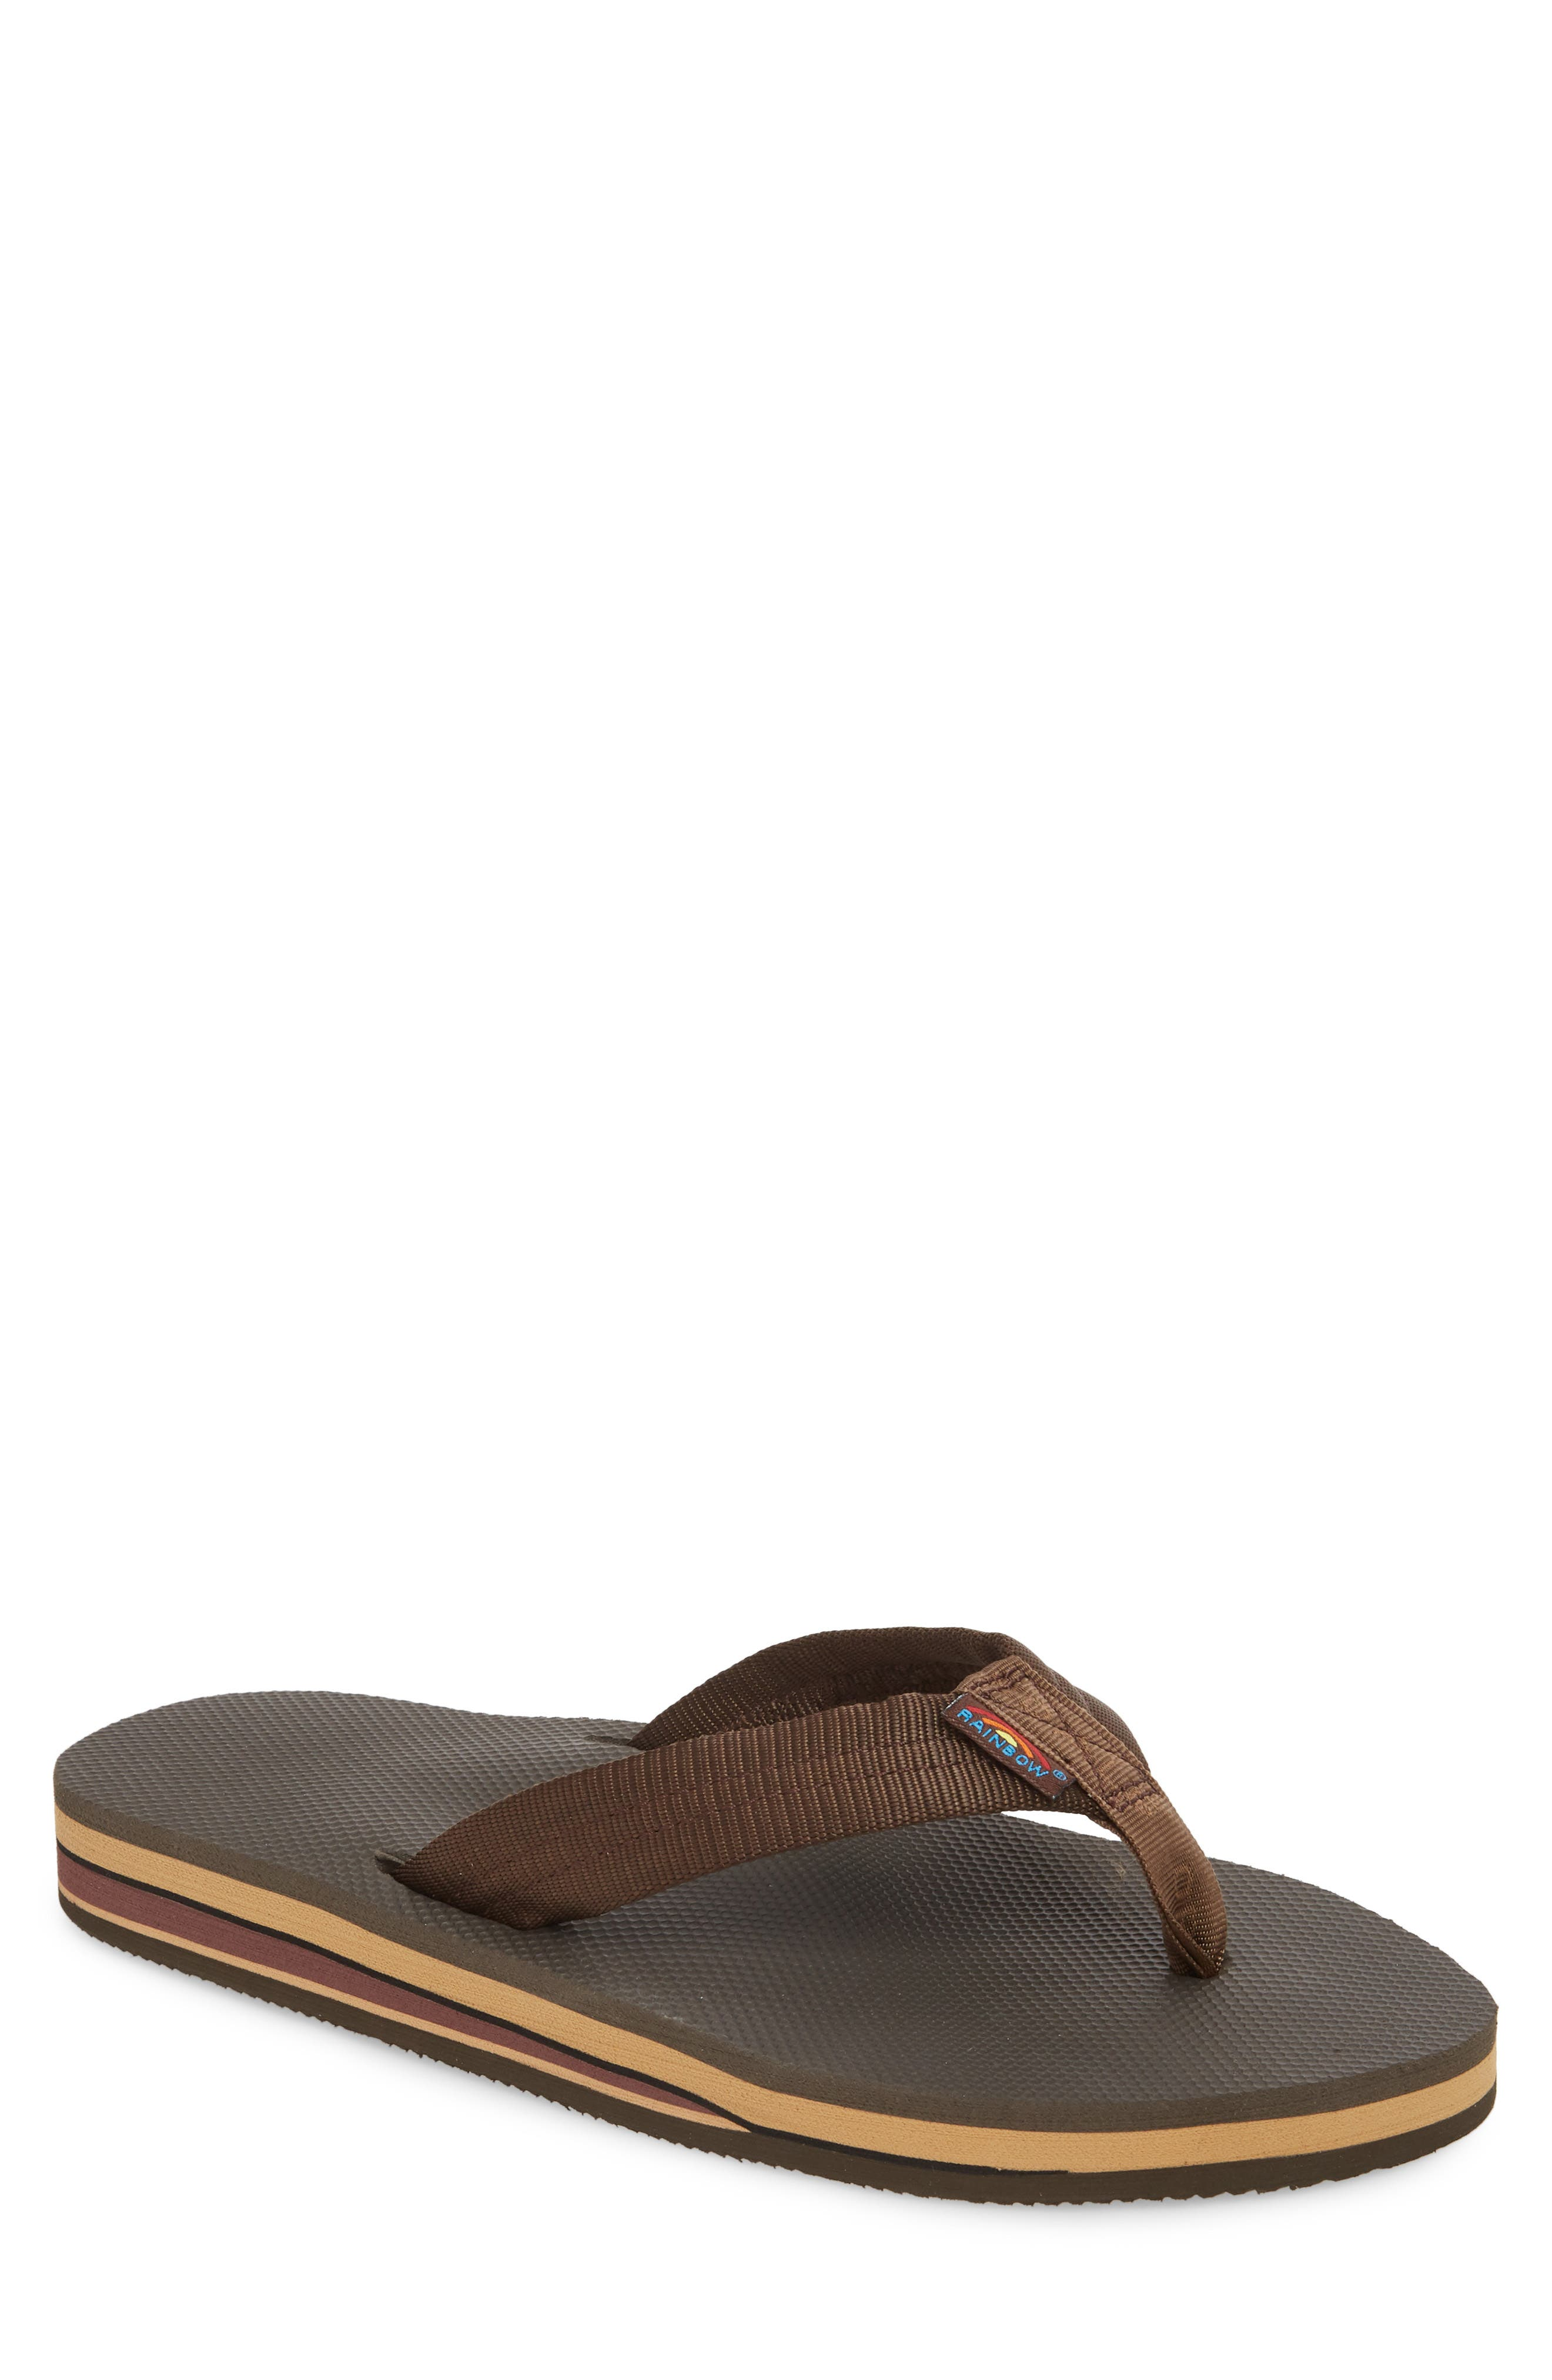 97e545cac Rainbow Sandals   Flip-Flops